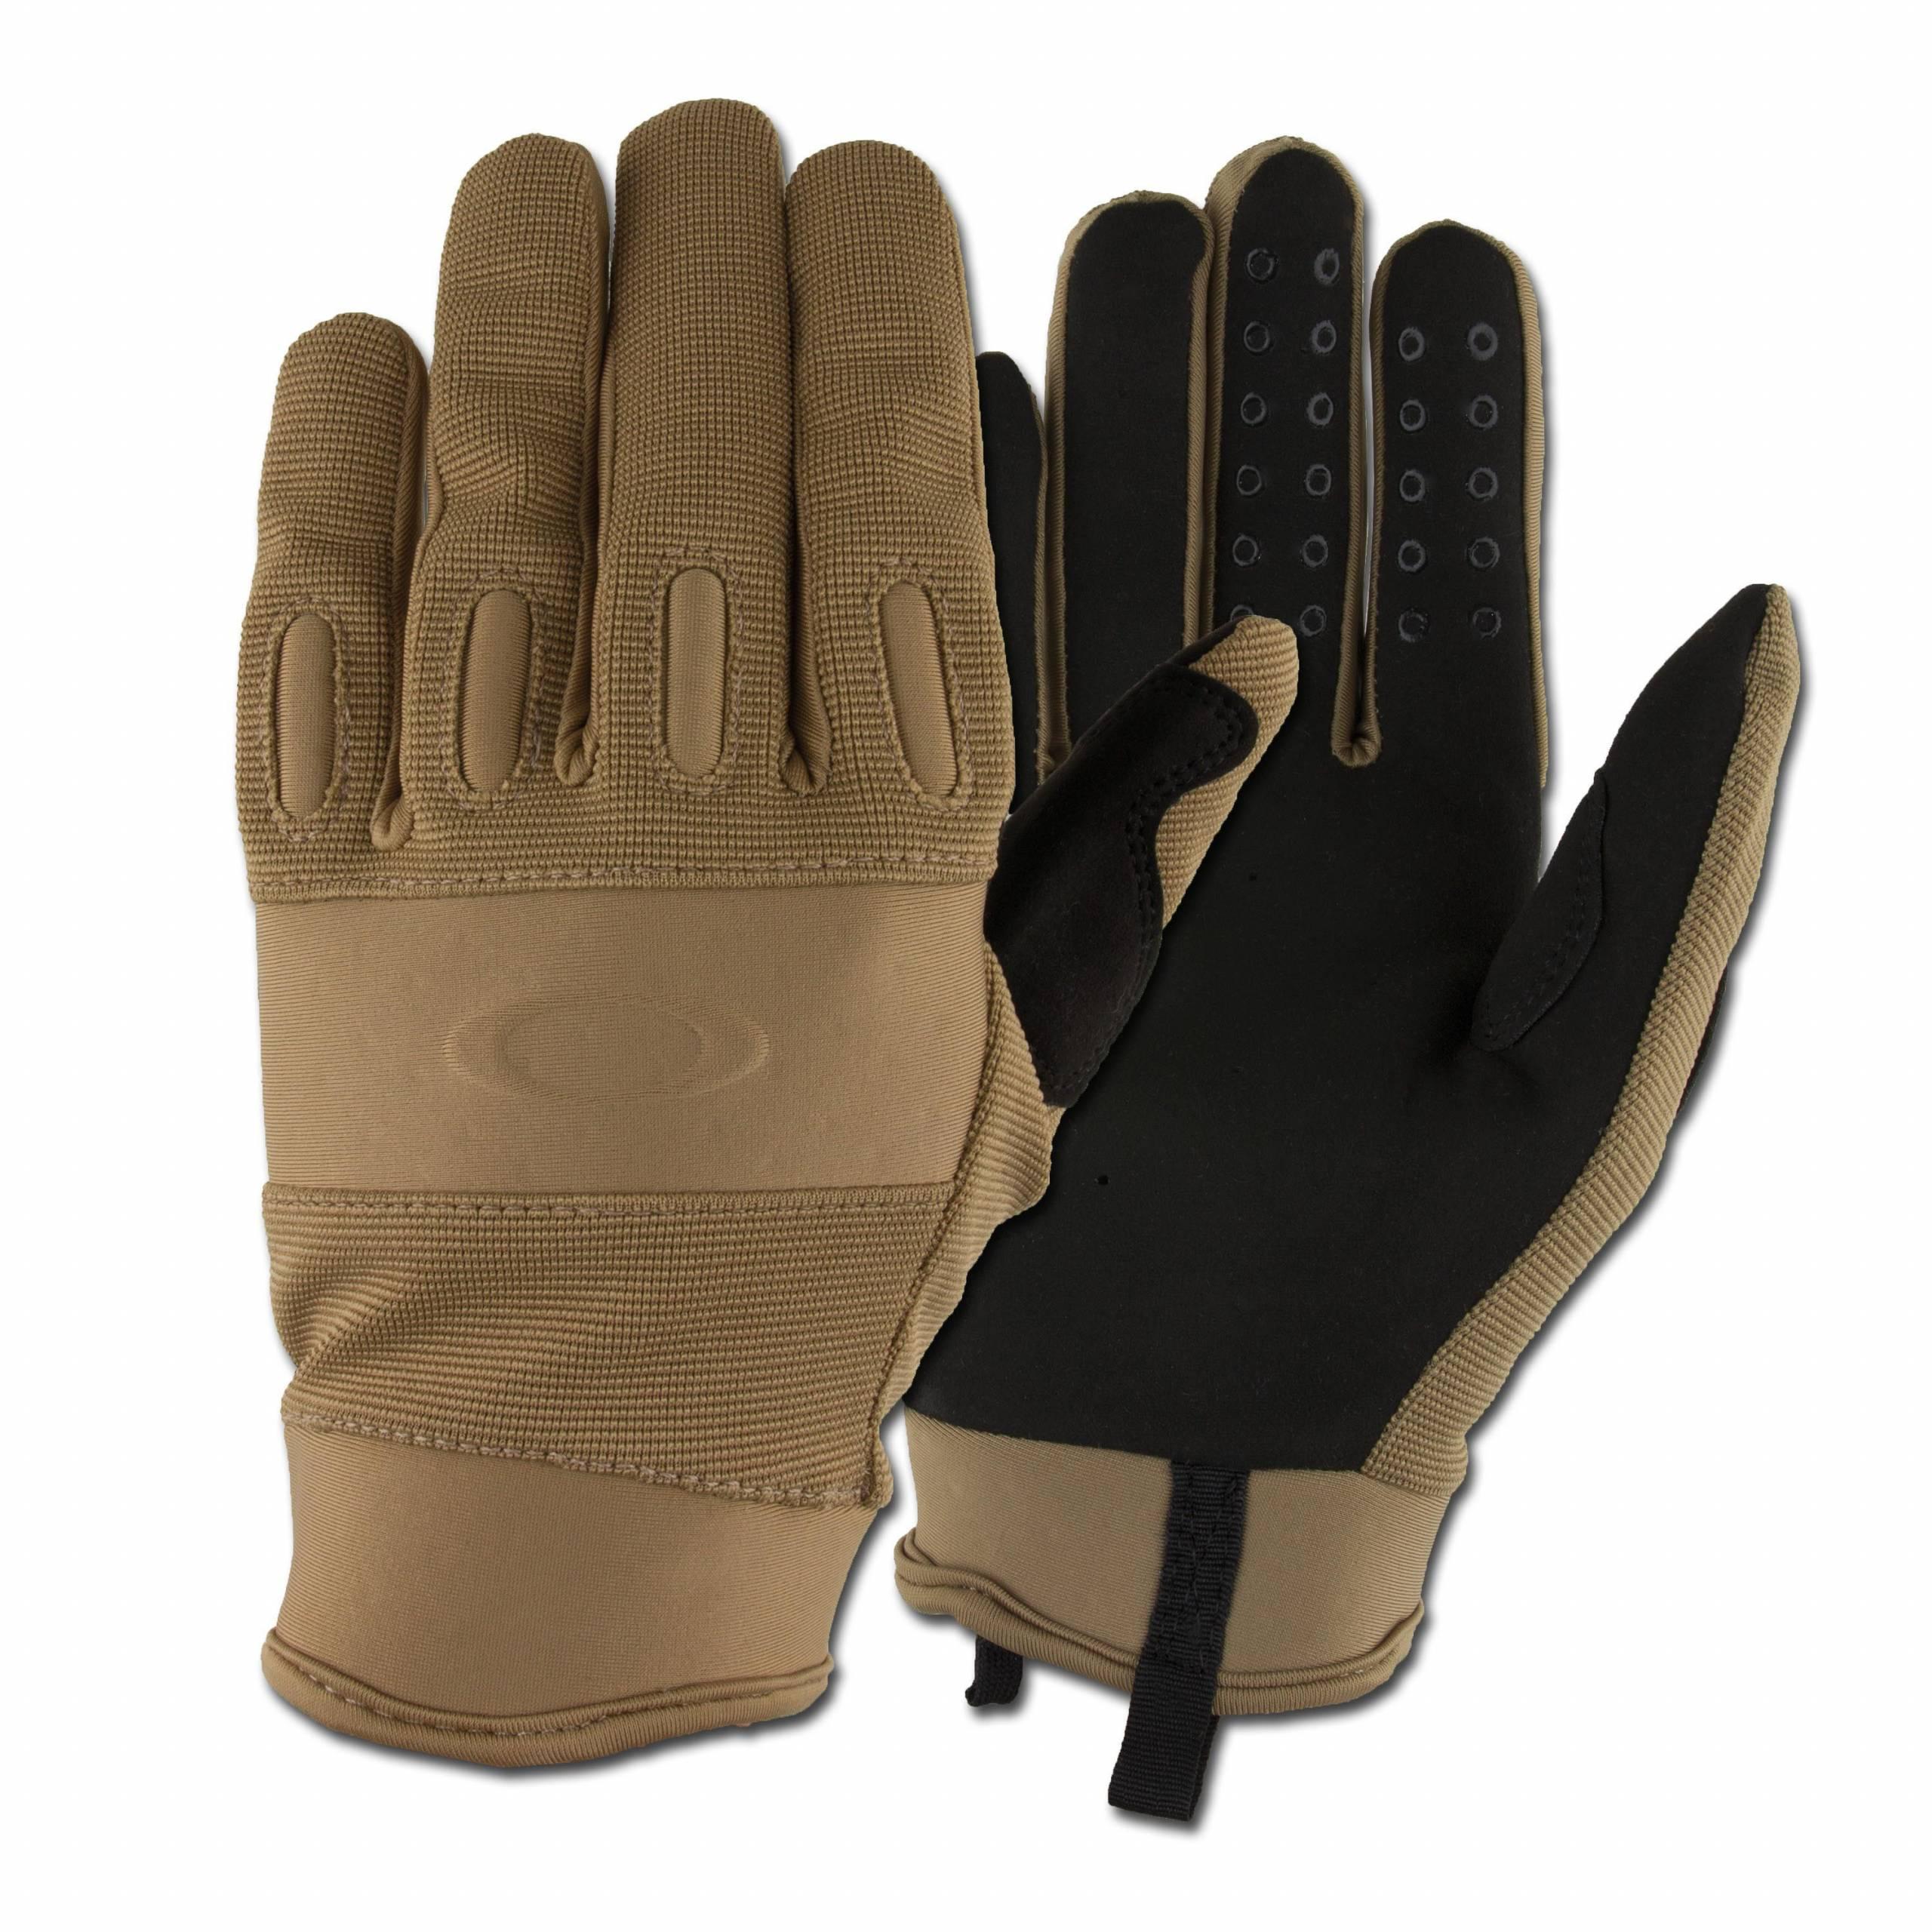 Handschuh Oakley SI Lightweight coyote kaufen bei ASMC 0a3b0c2bd591